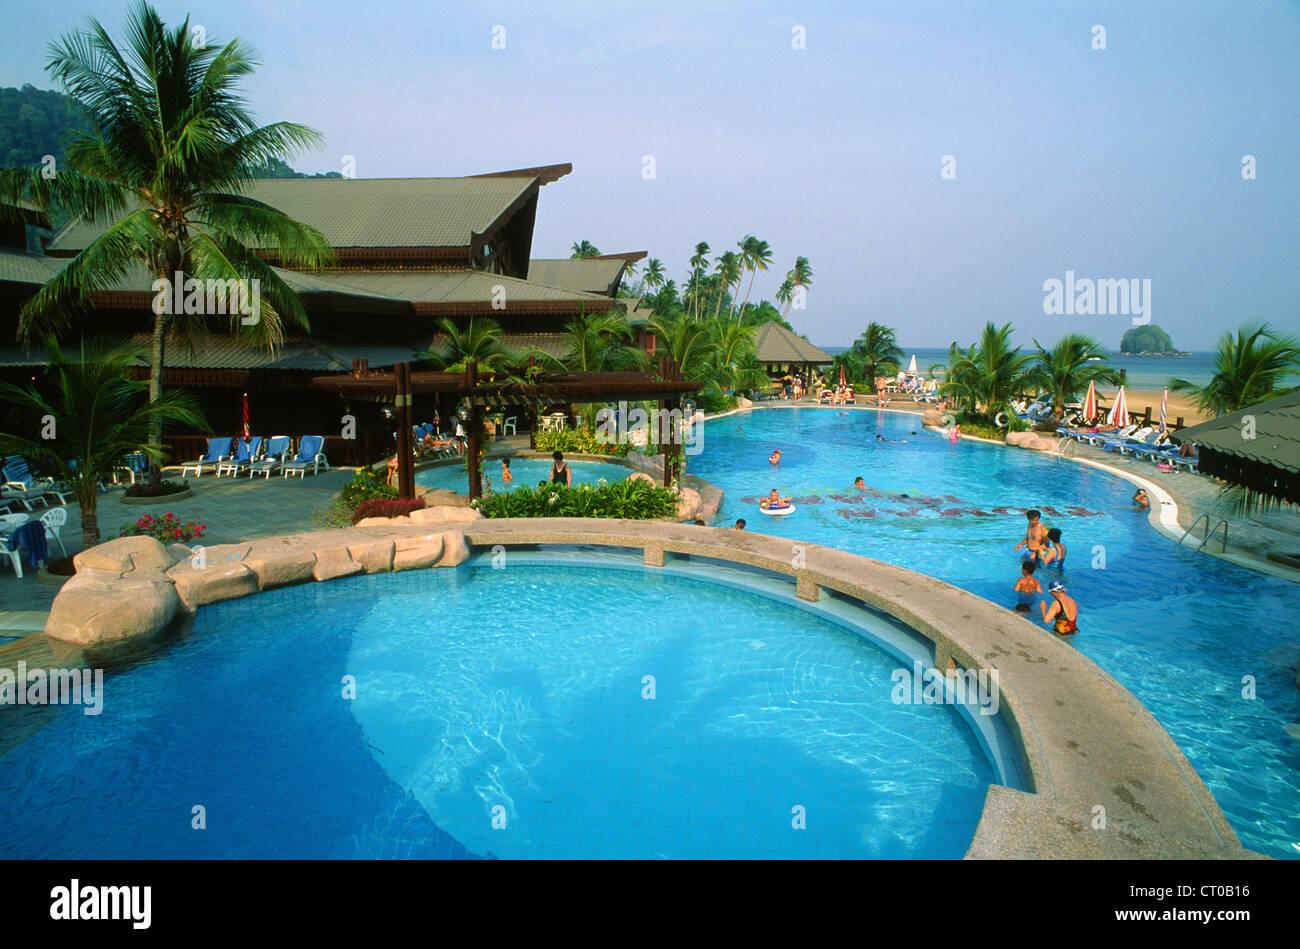 Malasia, la isla de Tioman, el Berjaya Resort, piscina Foto de stock